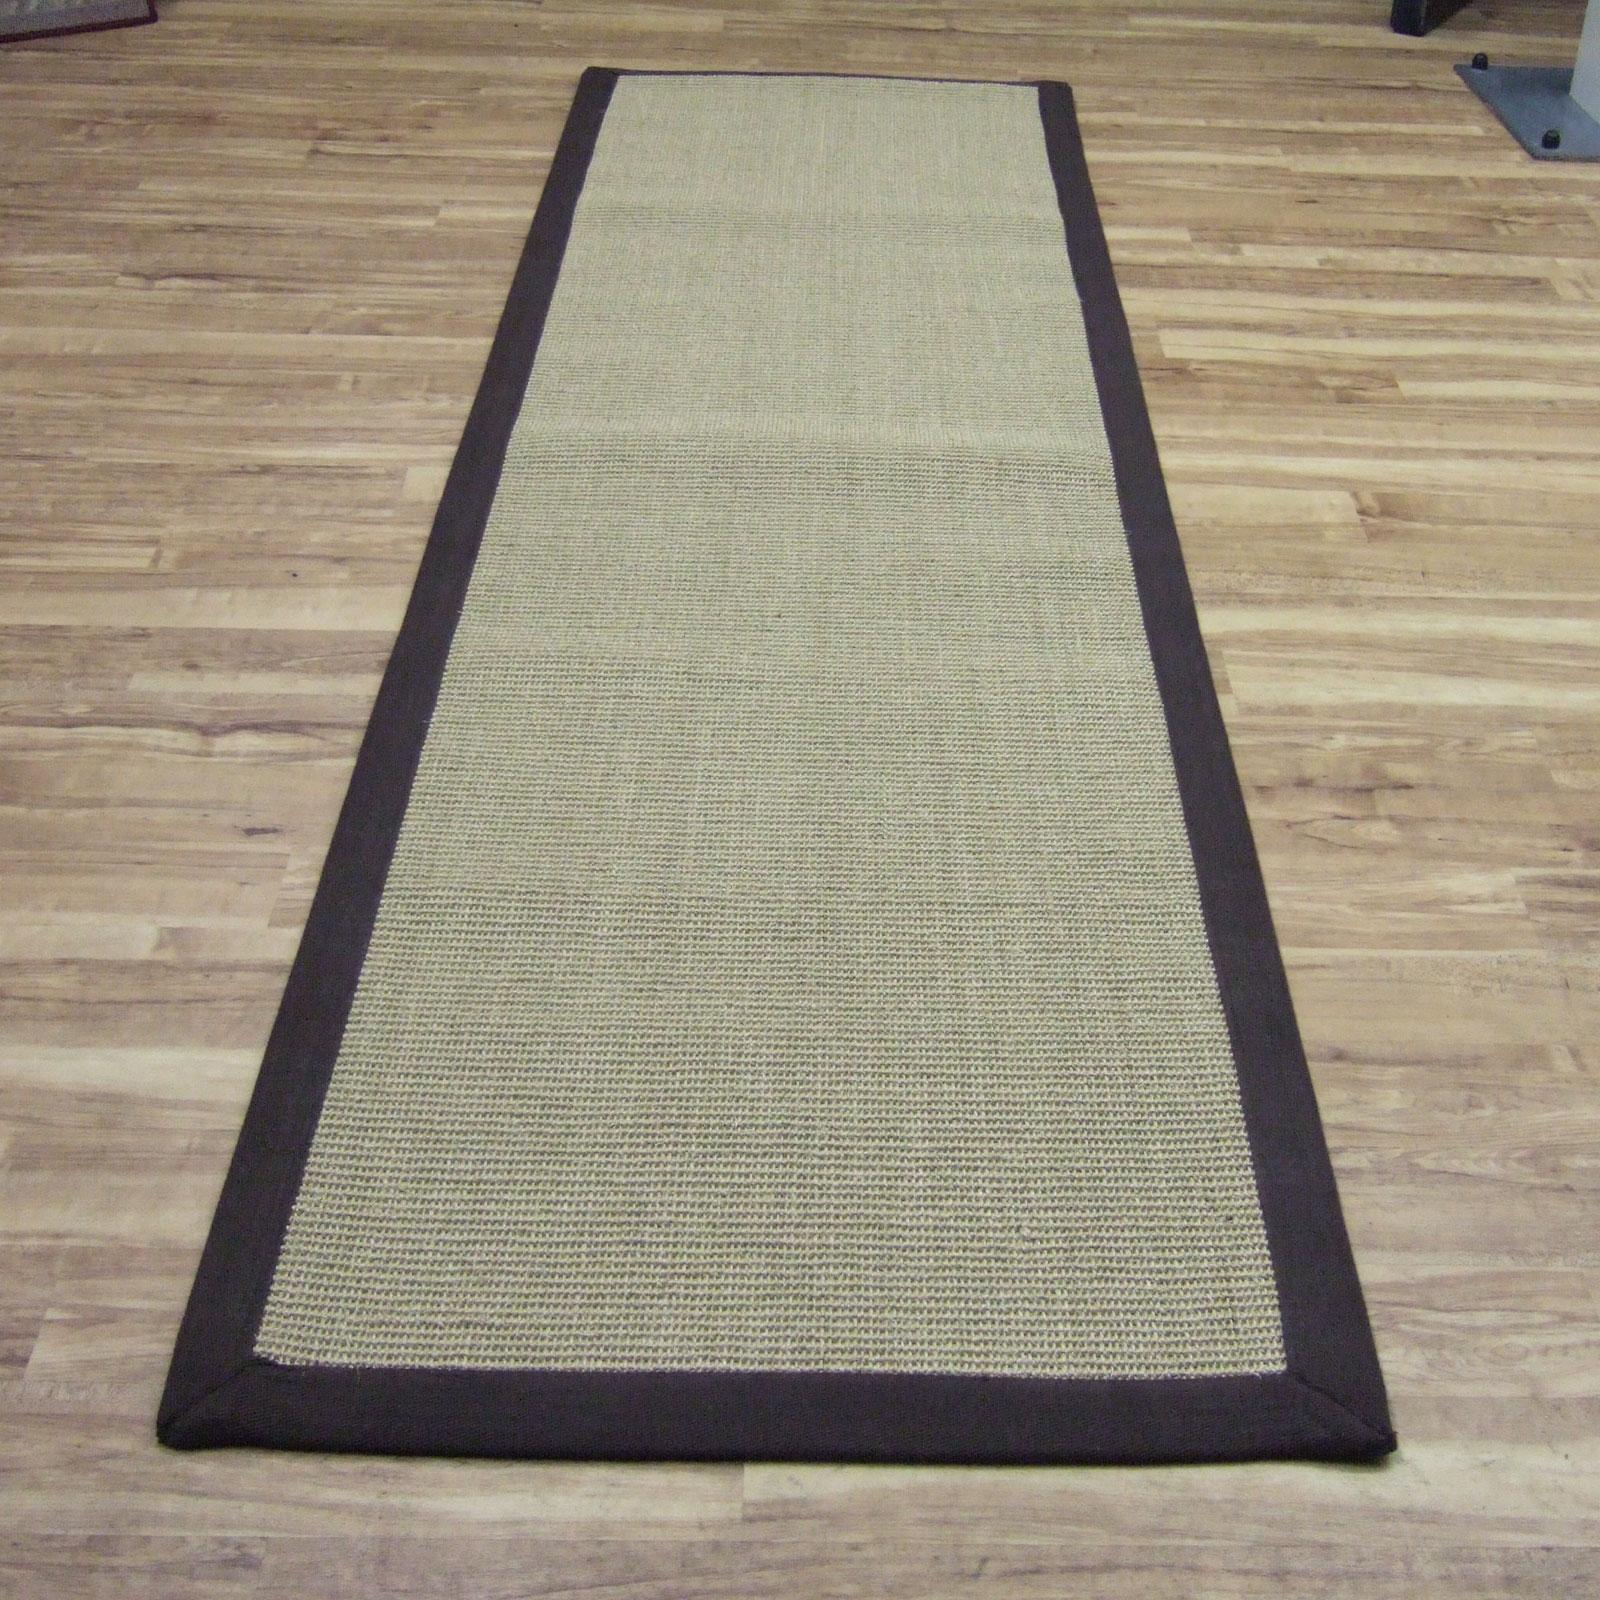 Flooring Lovely Hallway Runners For Floor Decor Idea Throughout Wool Runners Hallways (#9 of 20)